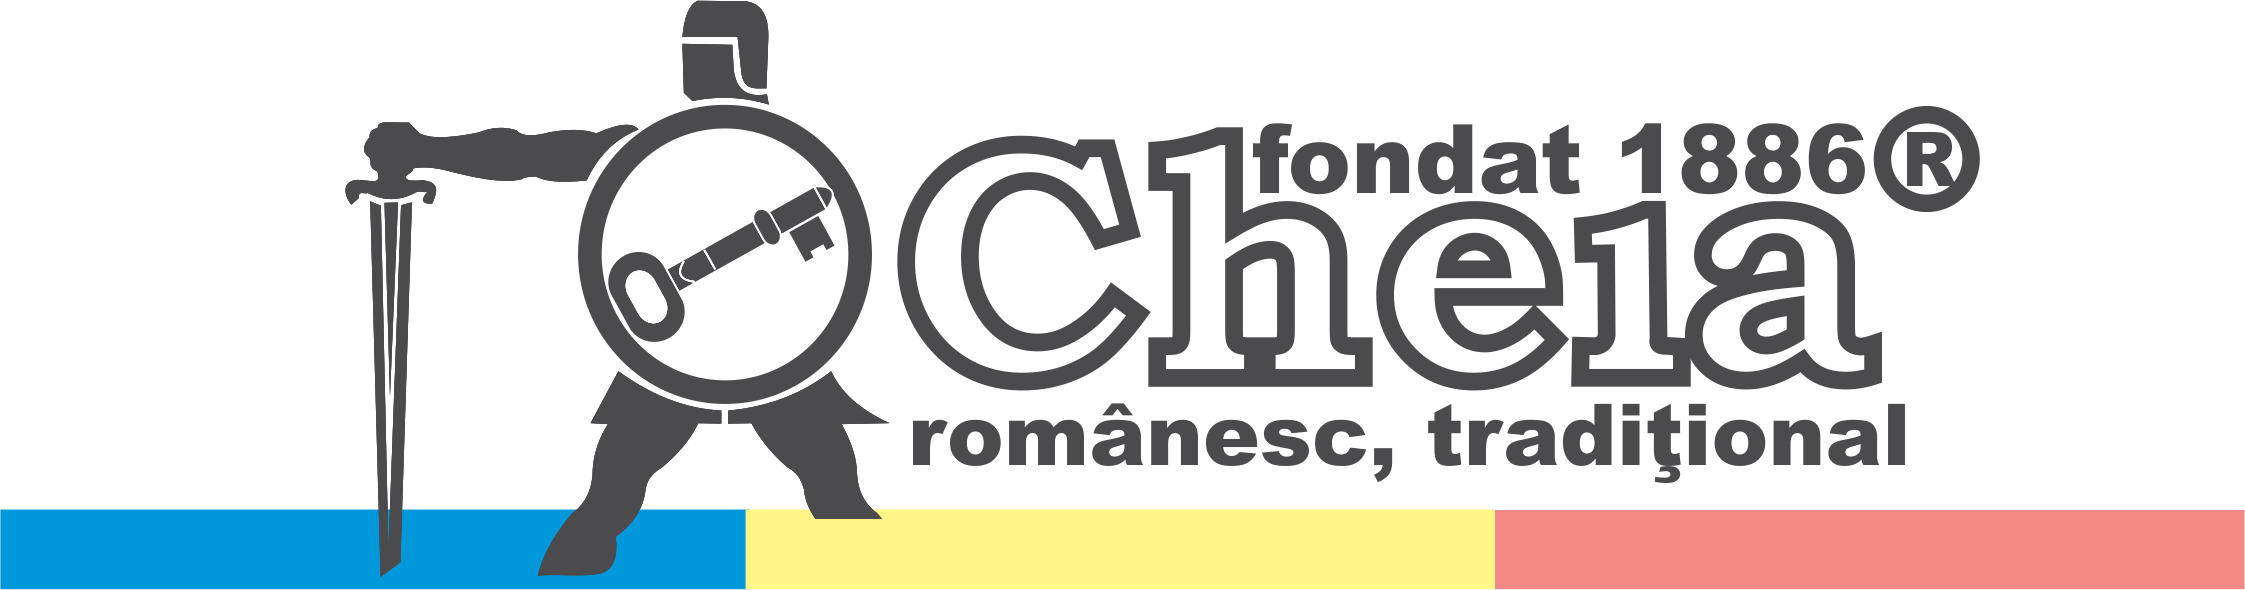 CHEIA romanesc, traditional, fondat 1886